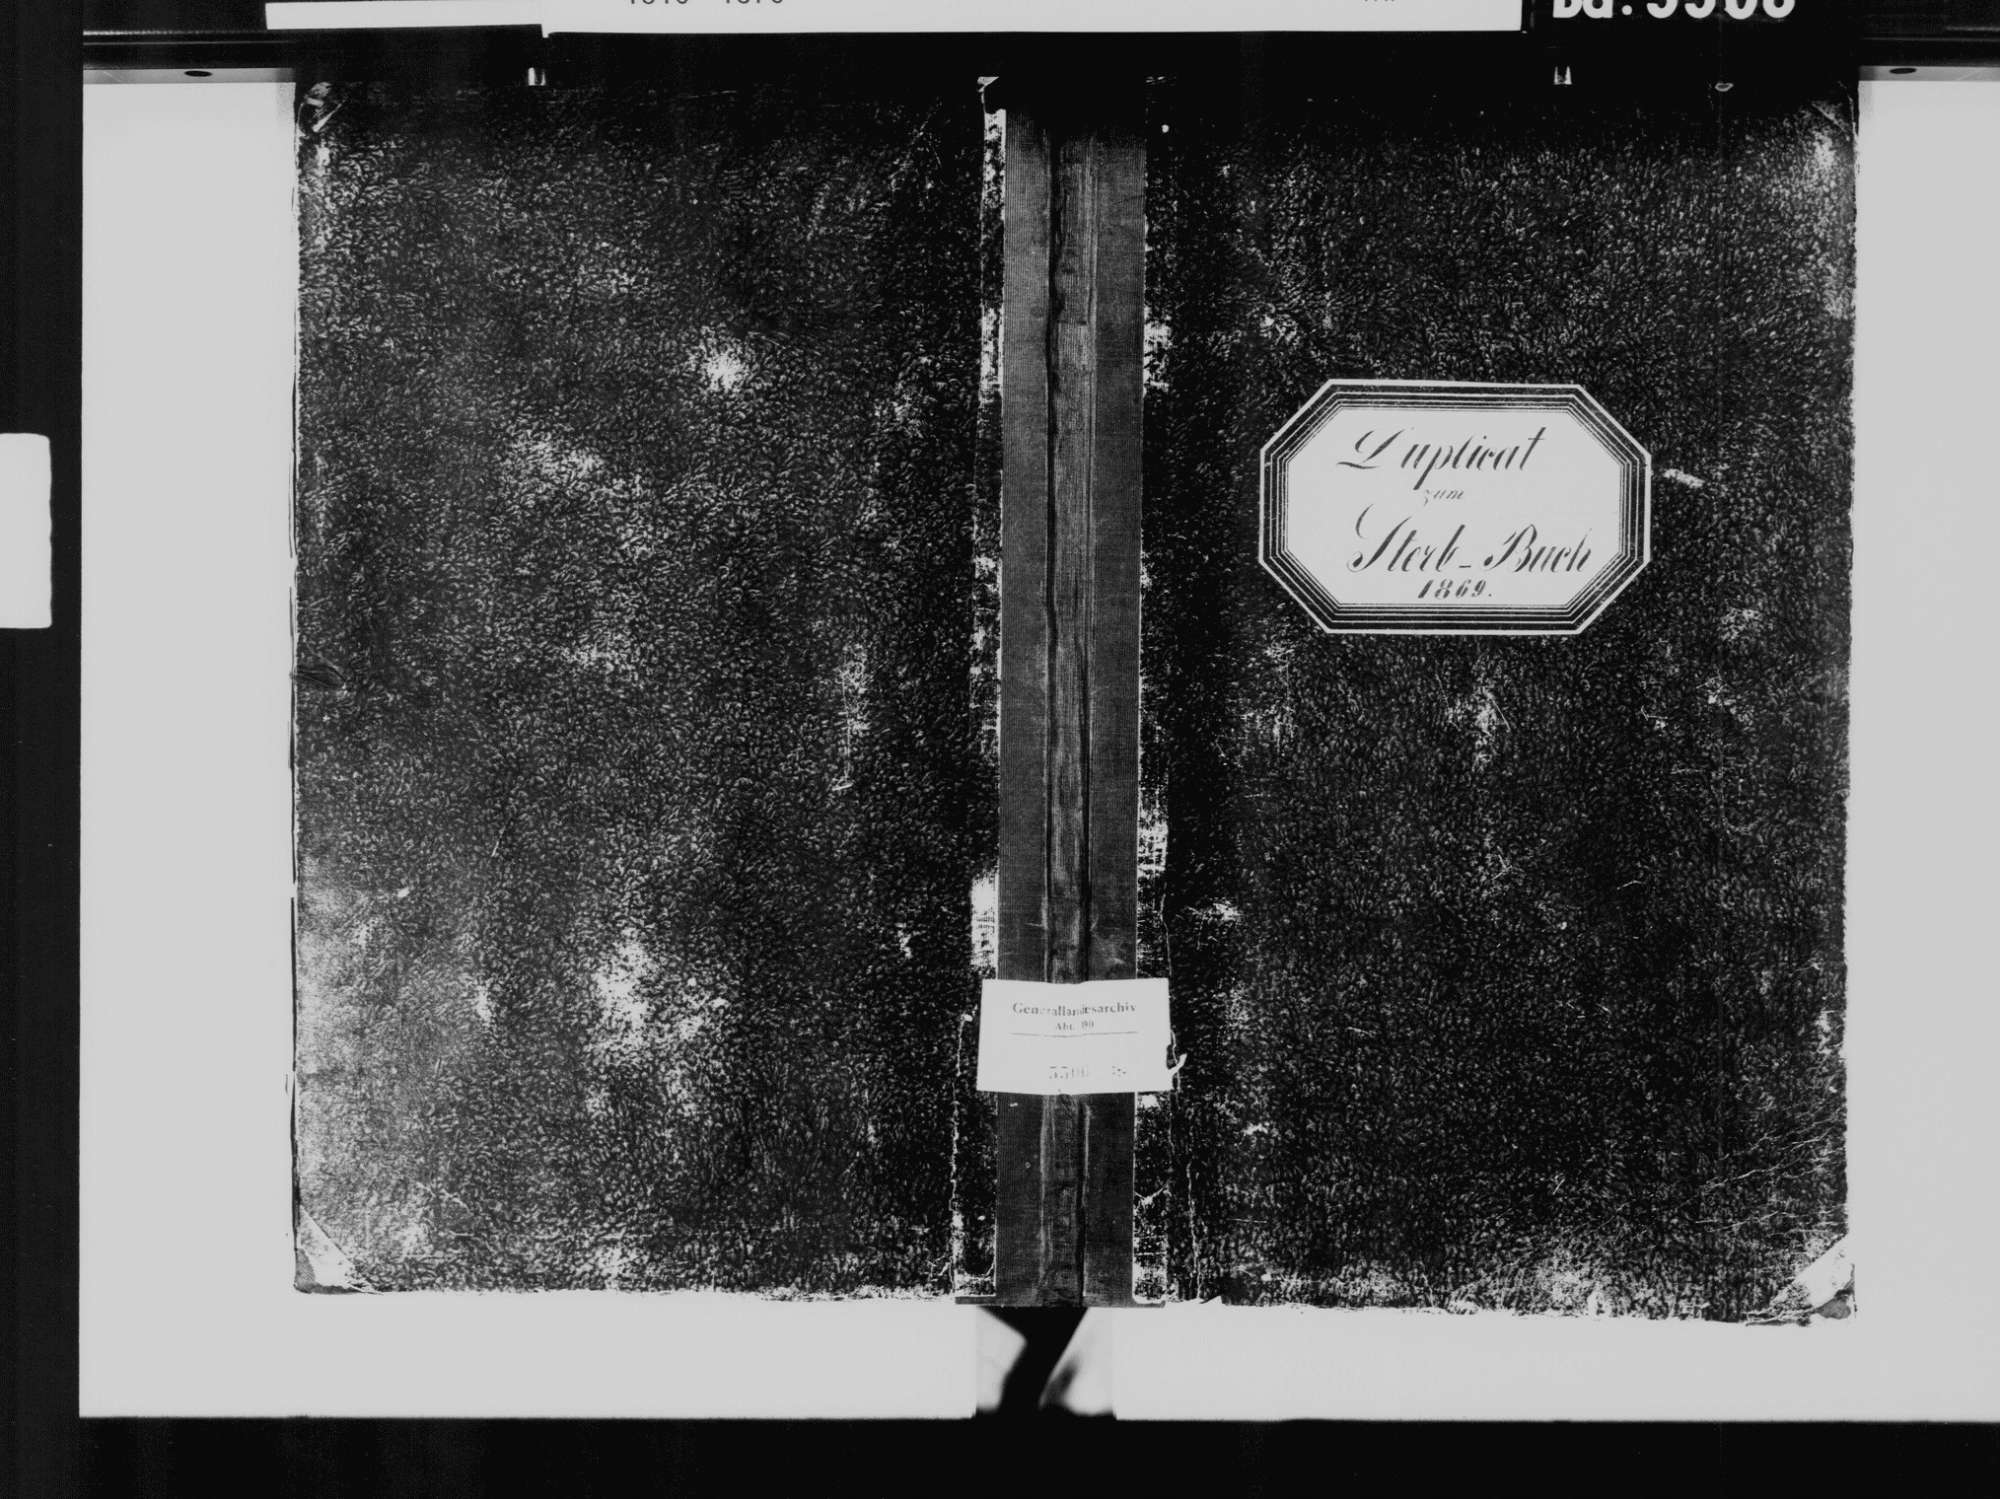 Villingen, Villingen-Schwenningen VS; Katholische Gemeinde: Sterbebuch 1869, Bild 2